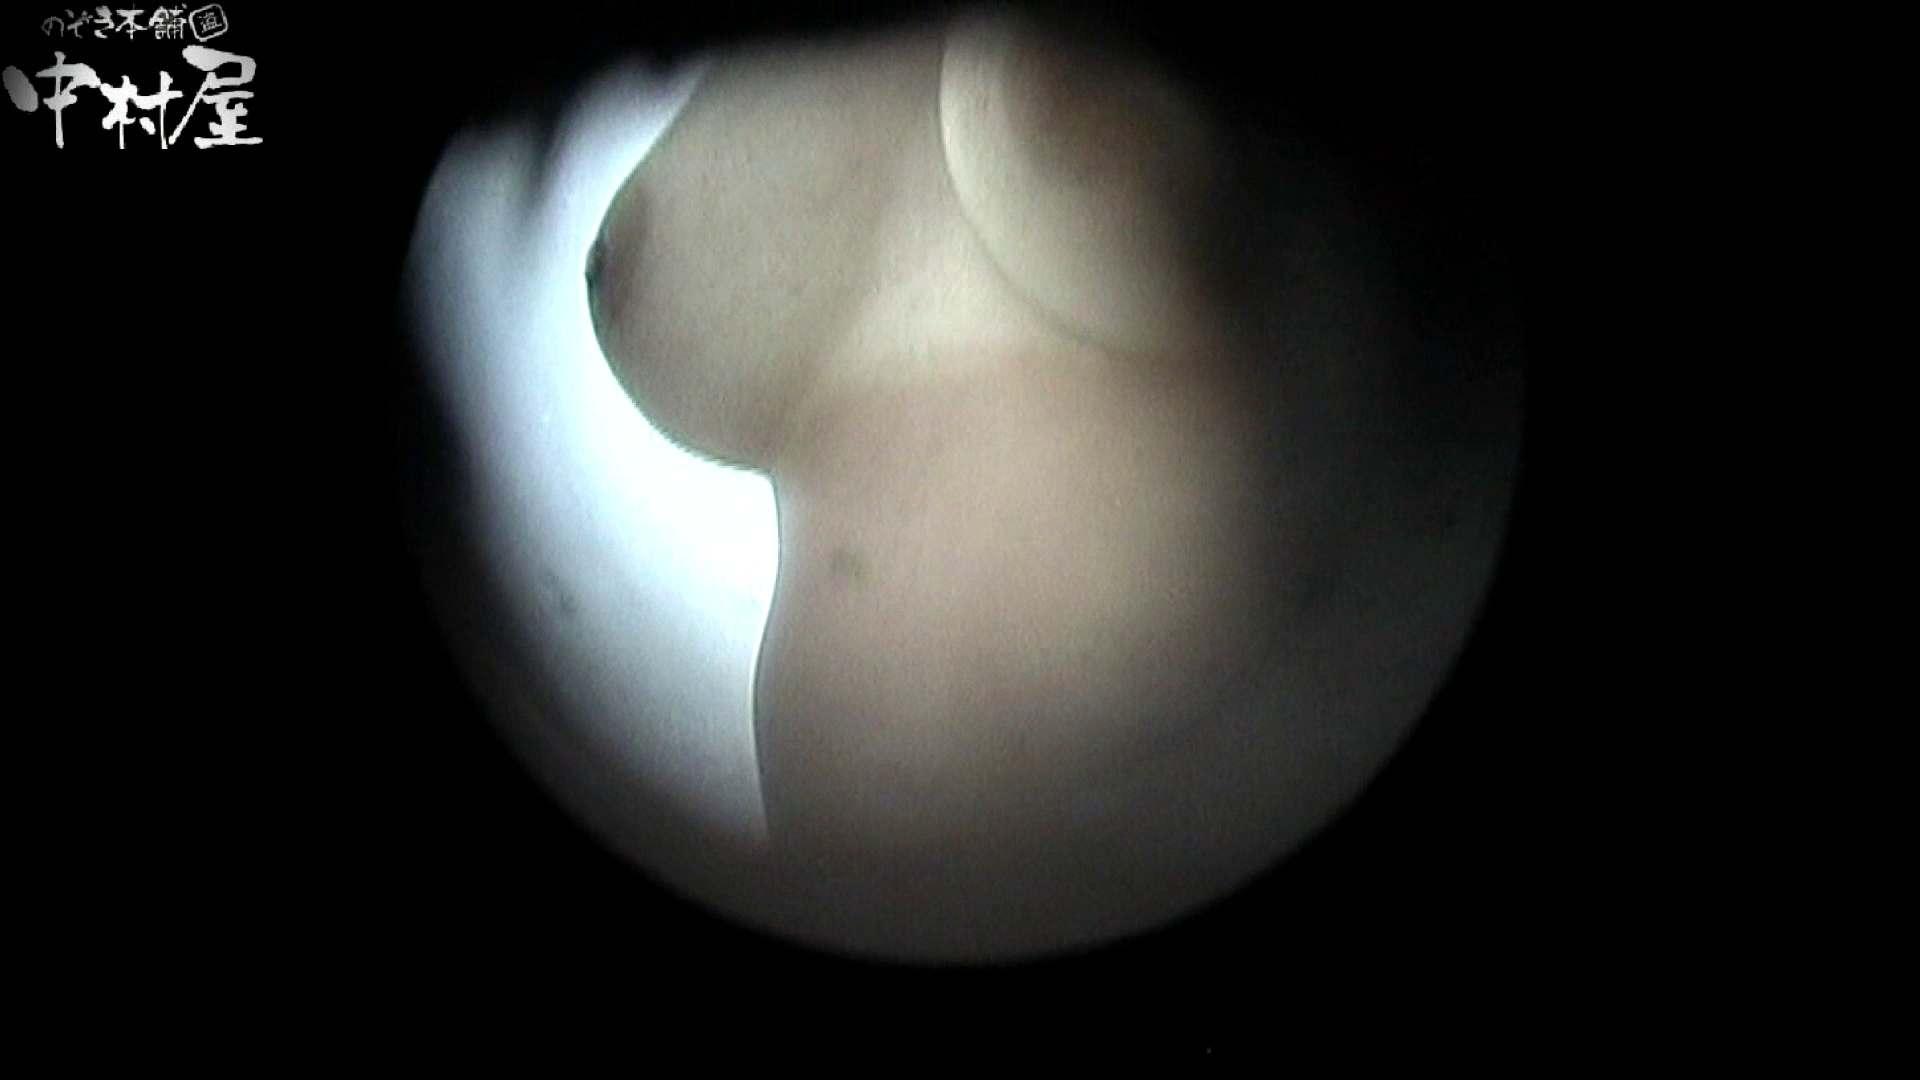 No.46 マシュマロ巨乳が目の前でプルプル 巨乳 おめこ無修正画像 78連発 27